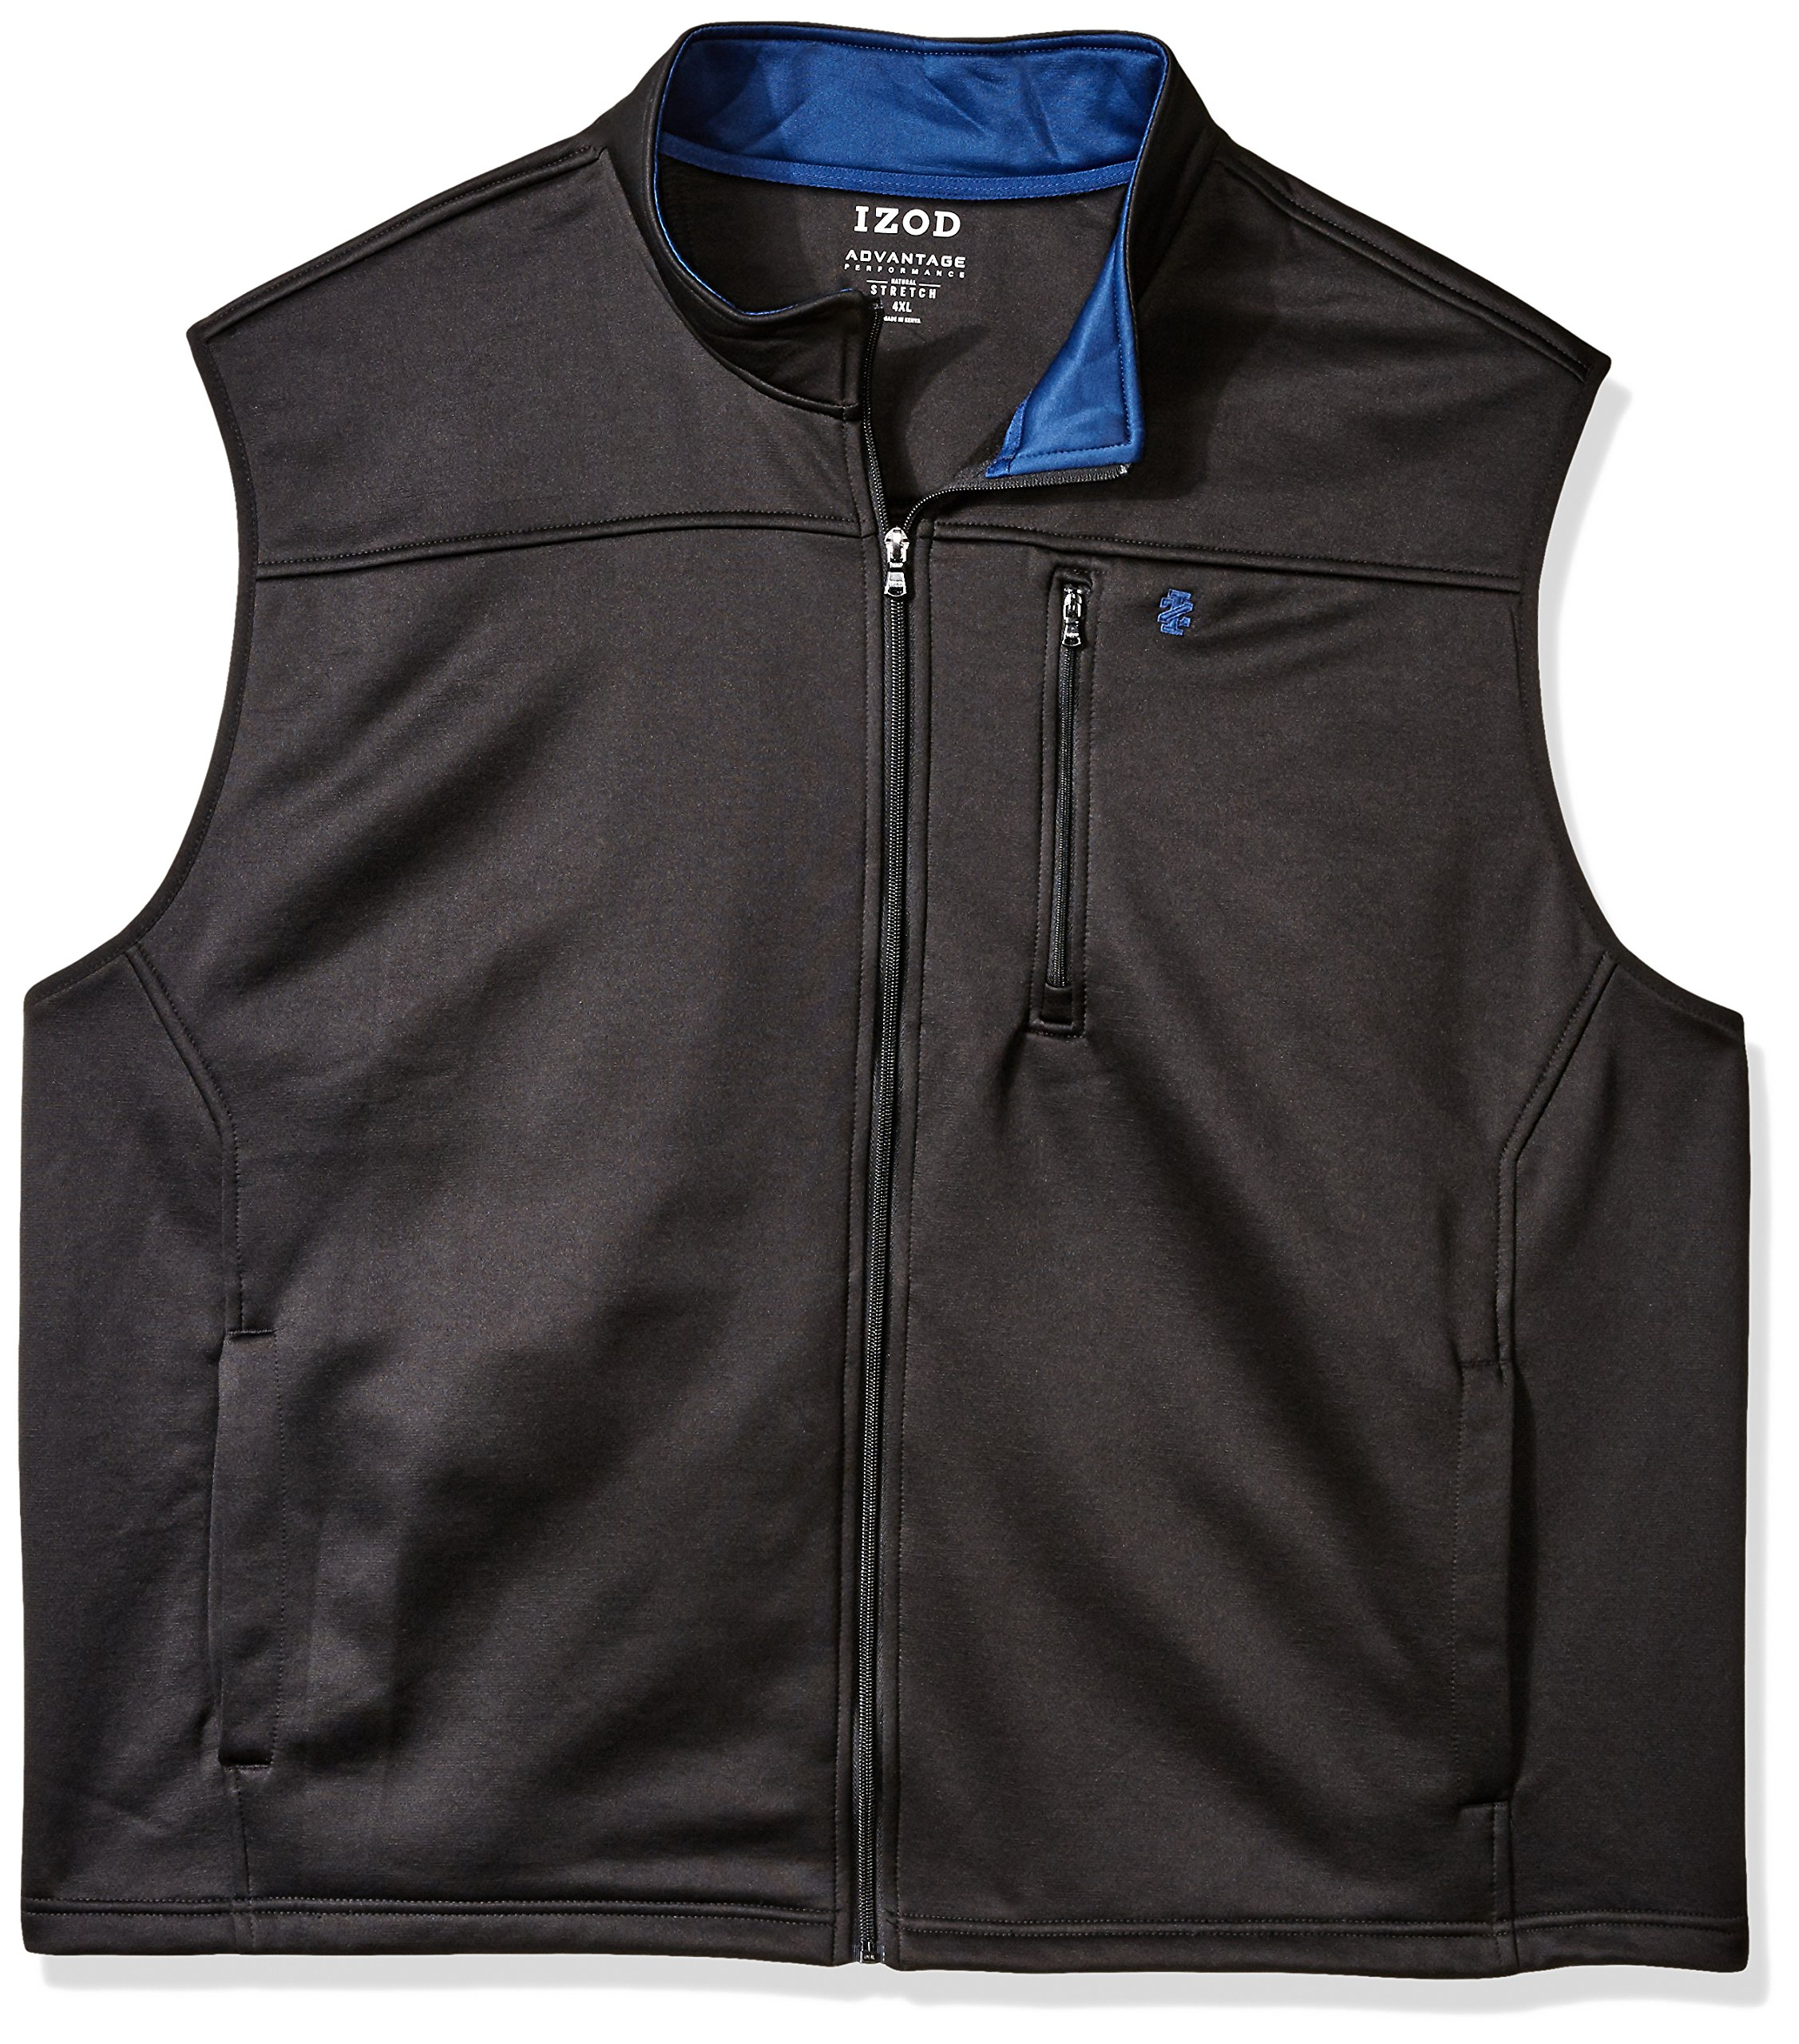 IZOD Men's Big Spectator Solid Fleece Vest, New Black, X-Large Tall